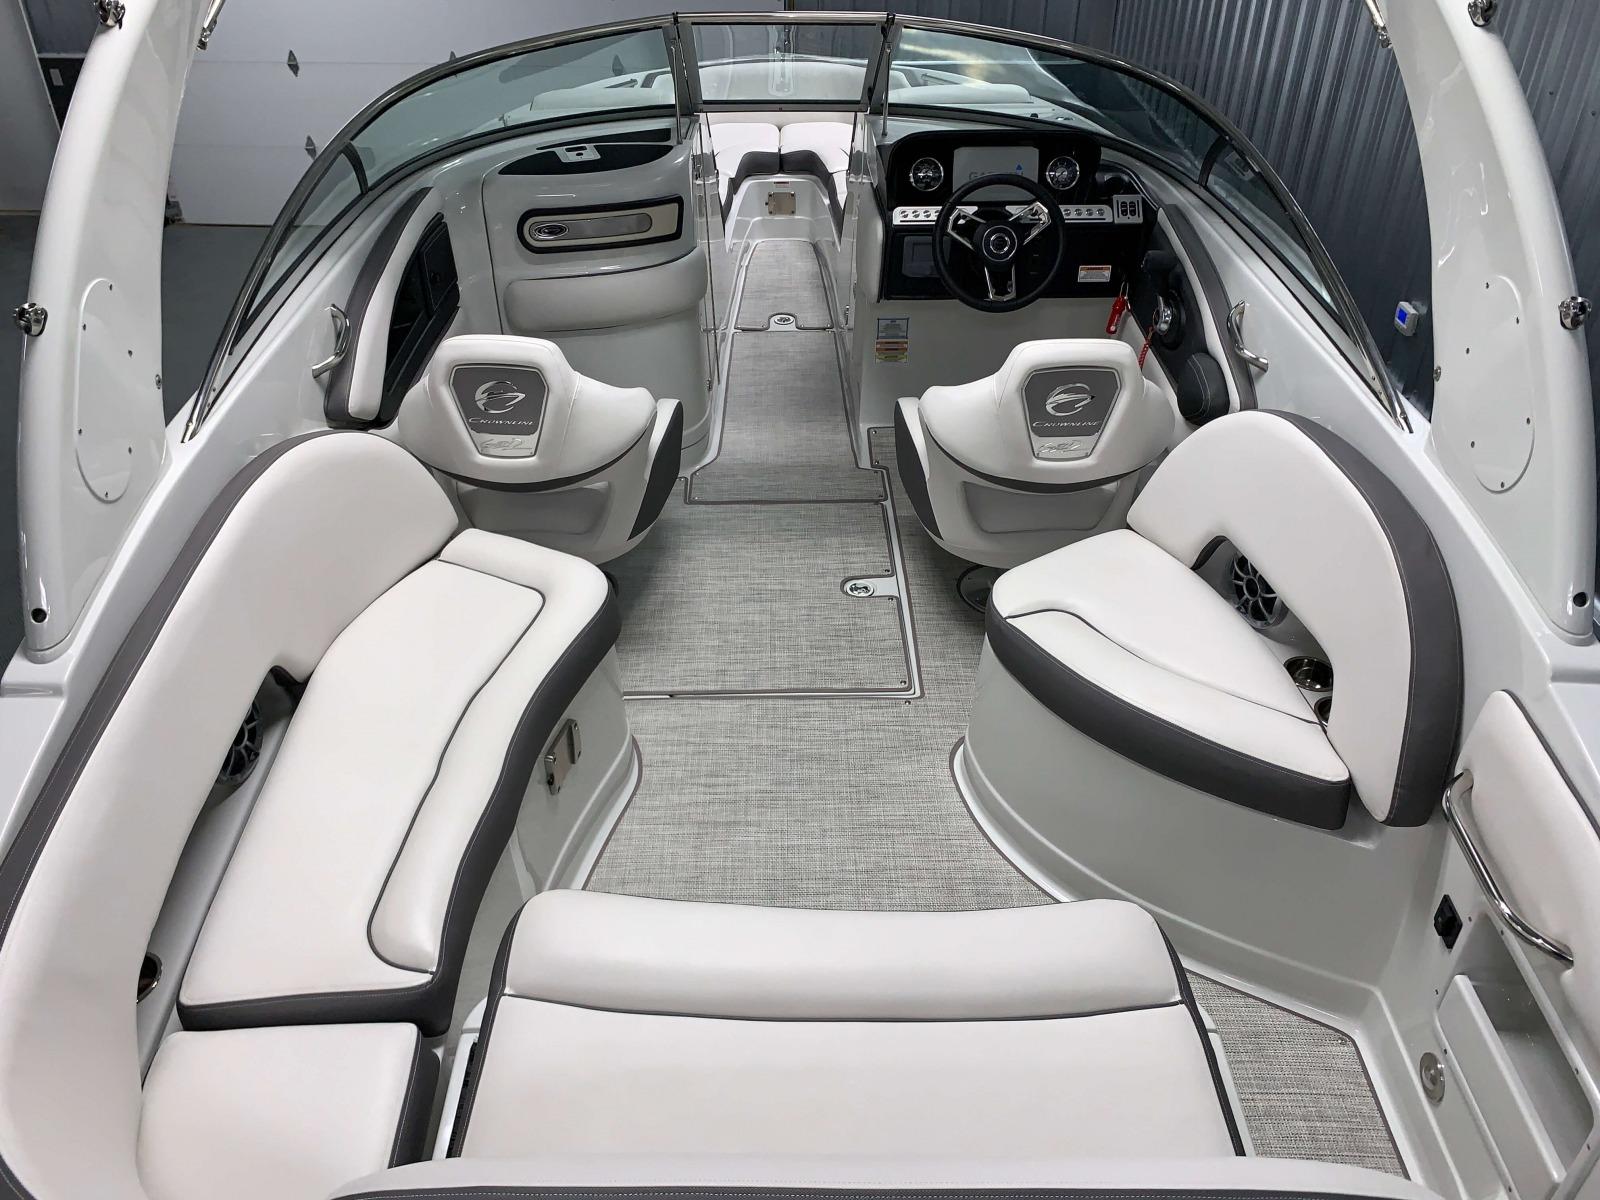 Snap-In Weave Vinyl Flooring of the 2021 Crownline 270 XSS Bowrider Boat